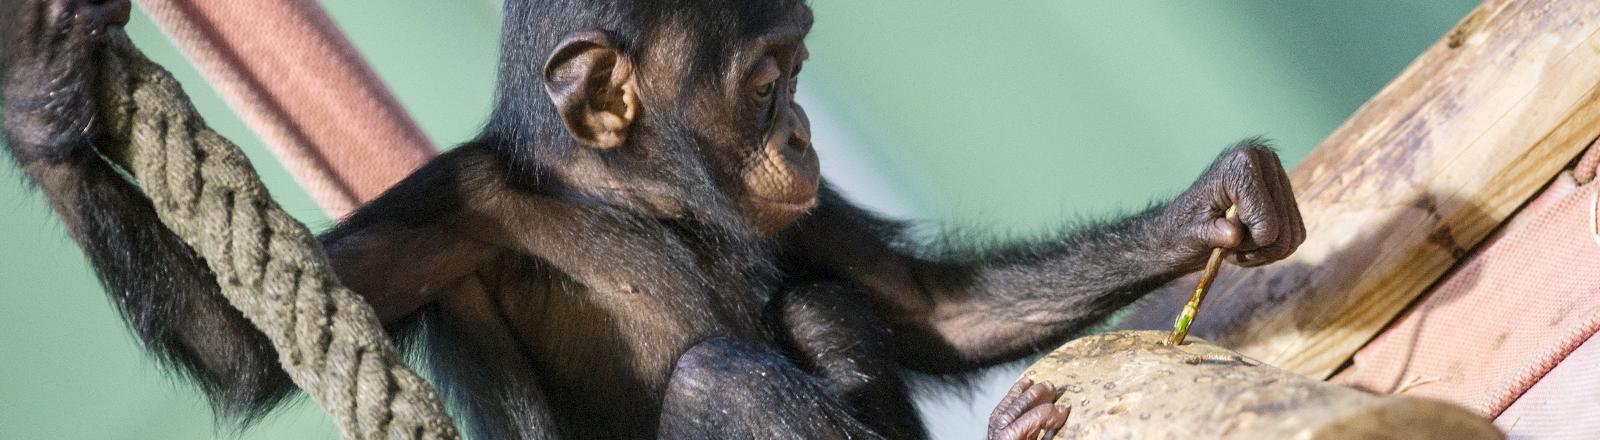 Schimpanse im Zoo.